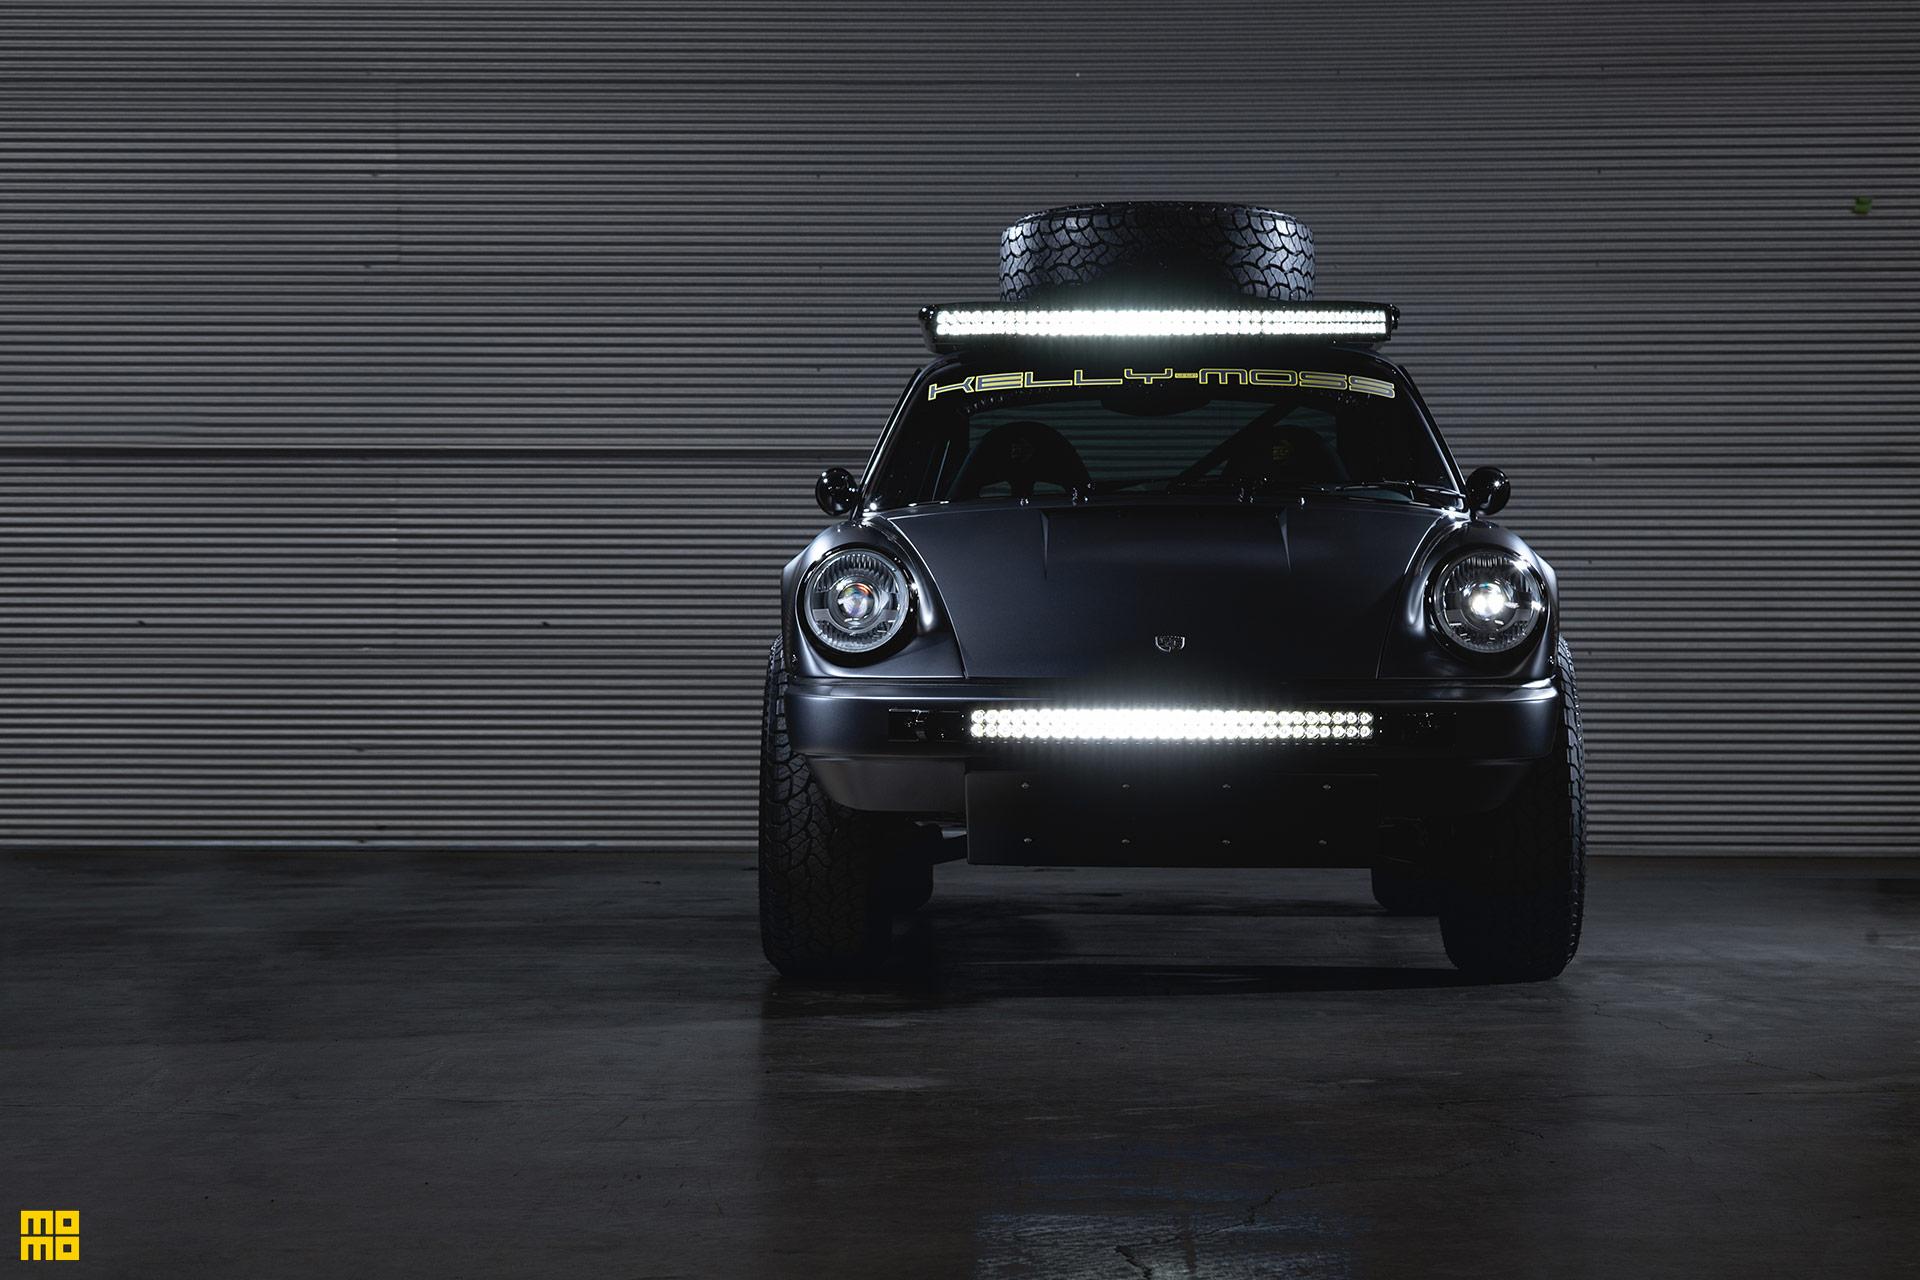 Matte Black 1984 Porsche 911 3.2 Carrera Willy Safari x MOMO Heritage